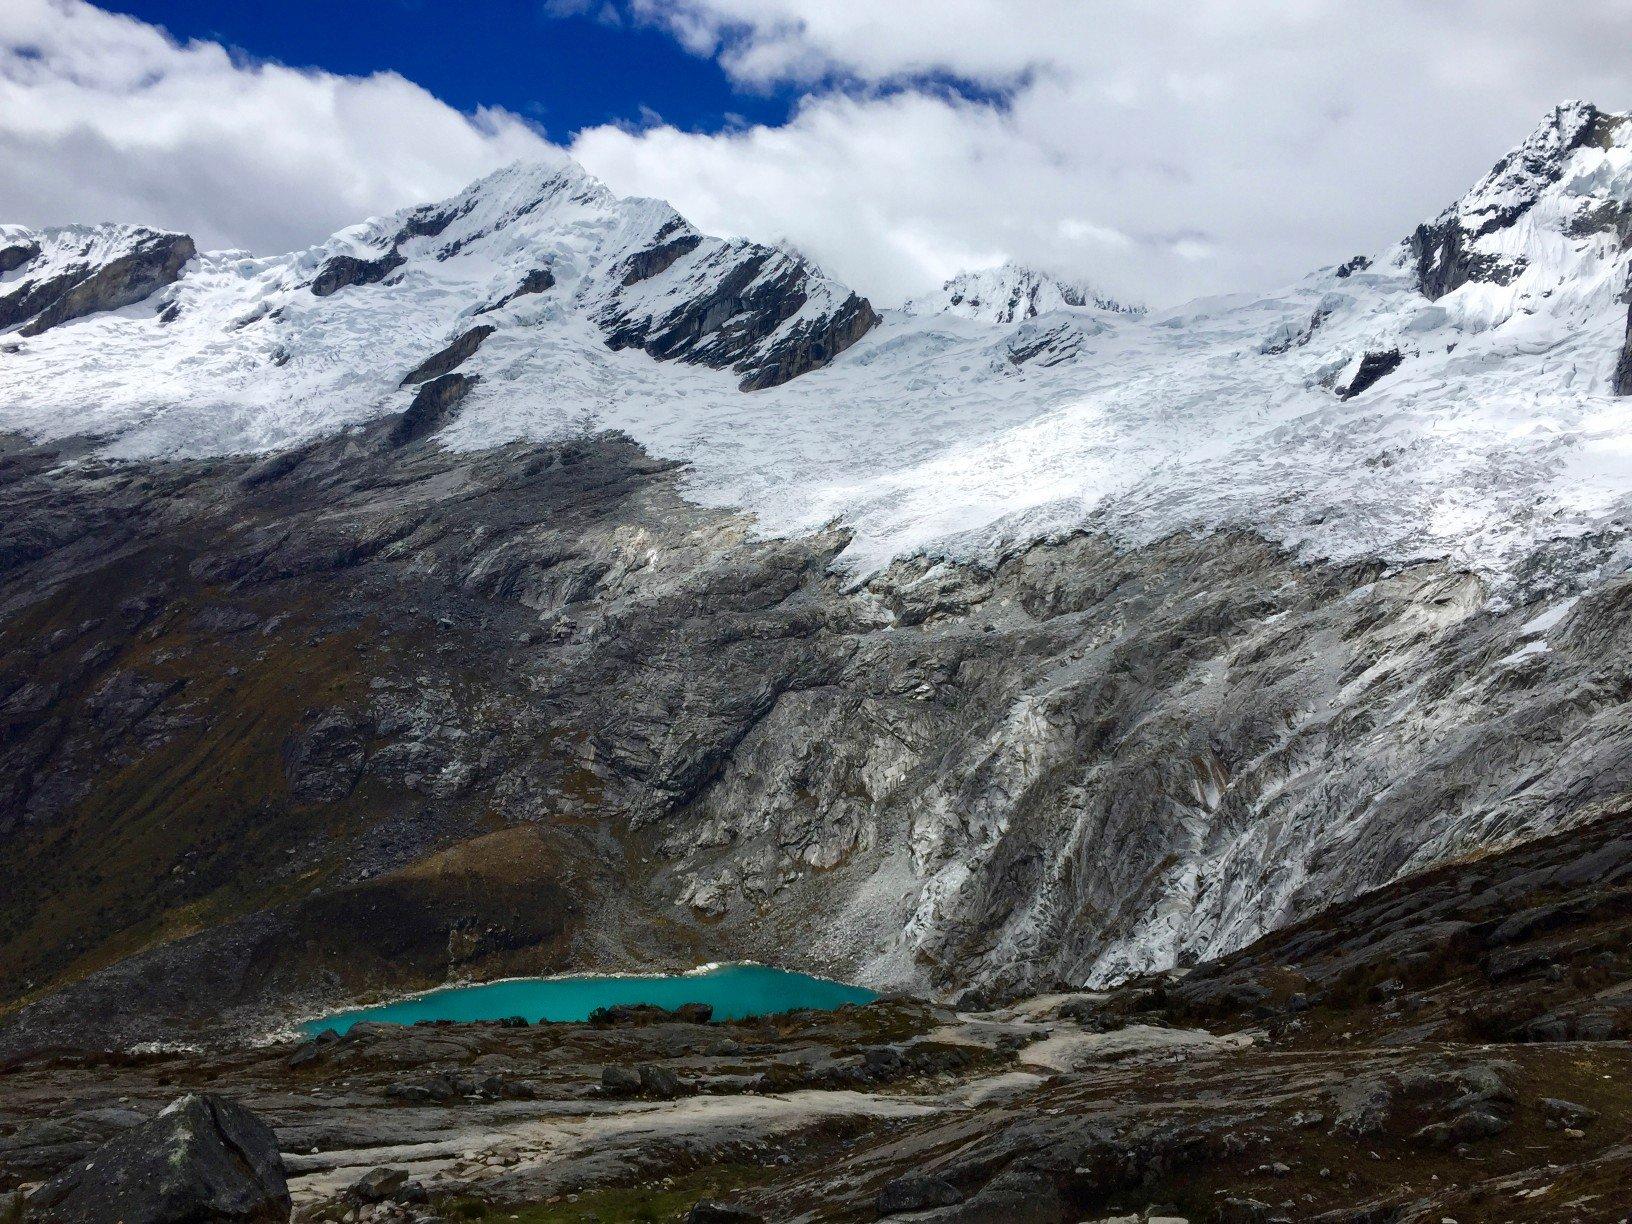 mountain and lake on Peru's Santa Cruz trek